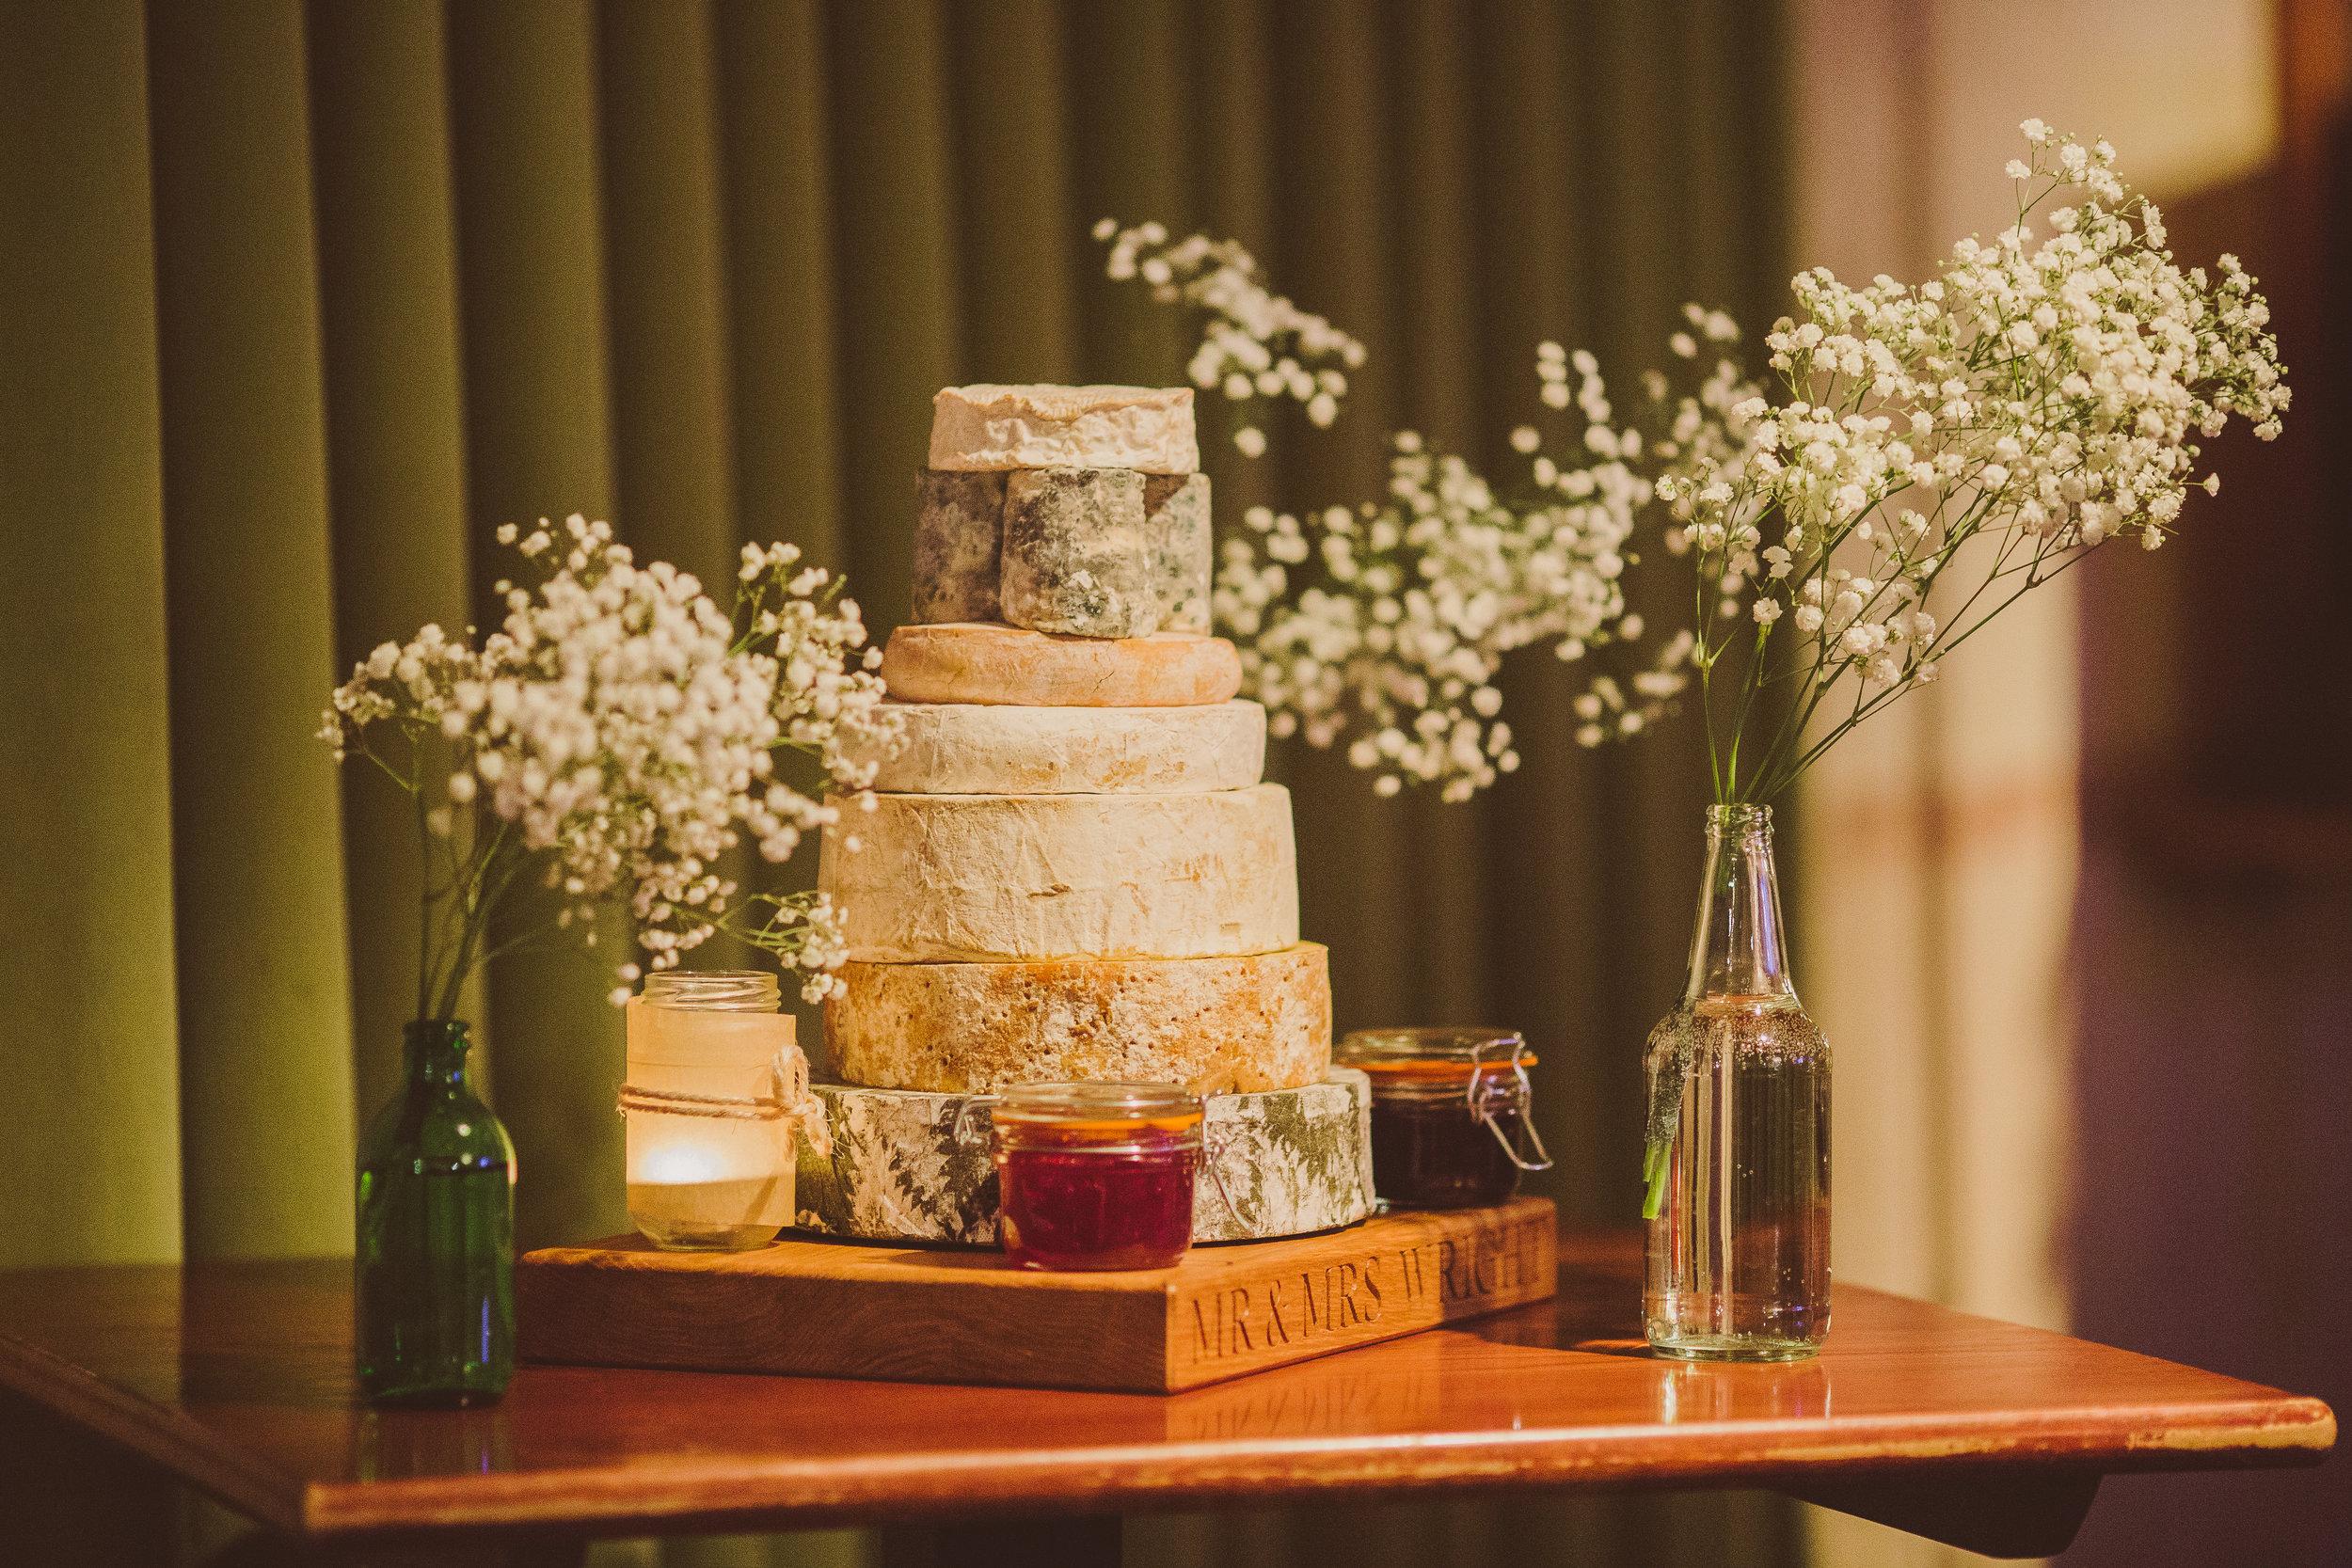 abinick Cheese Cake.jpg